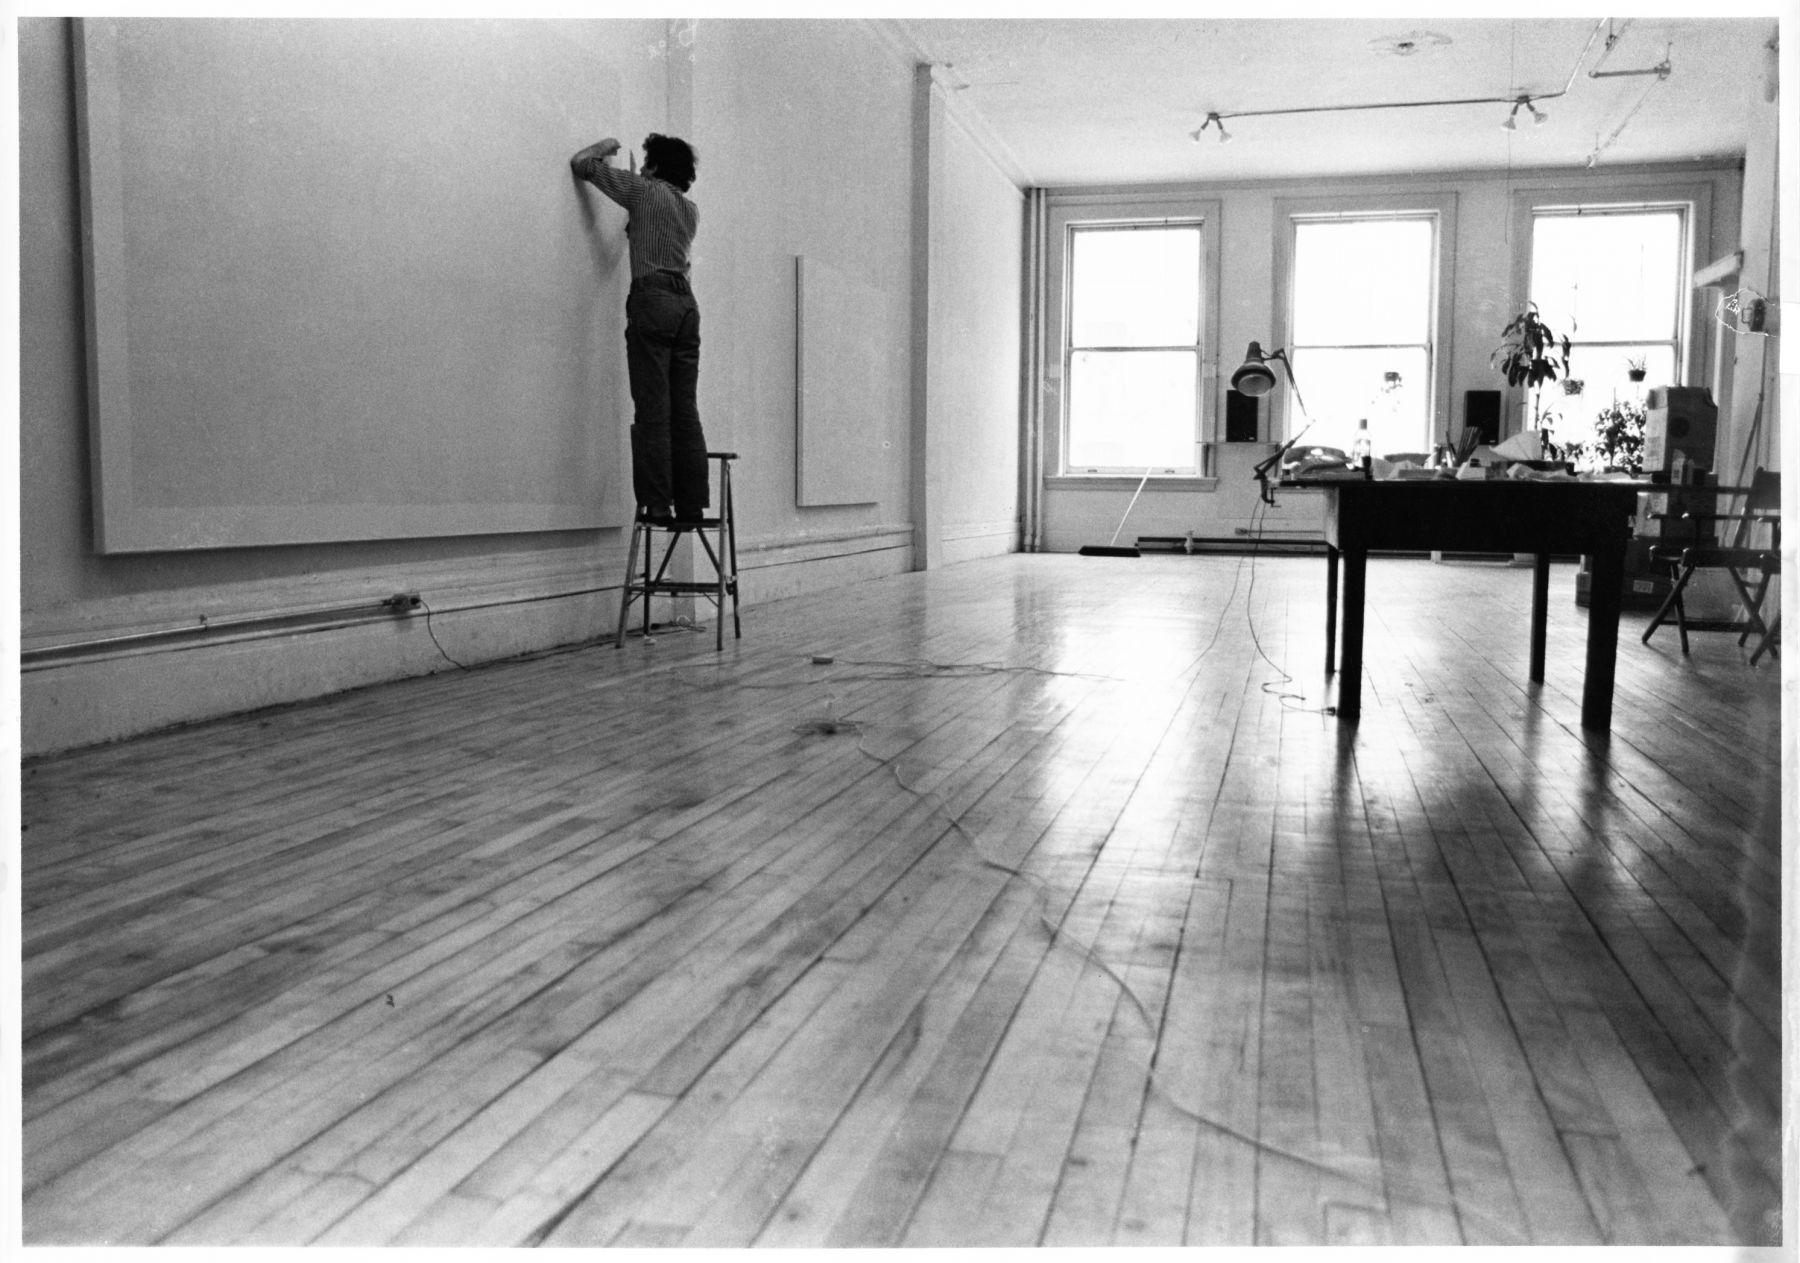 Image of Jacob El Hanani in his SoHo studio, 1974